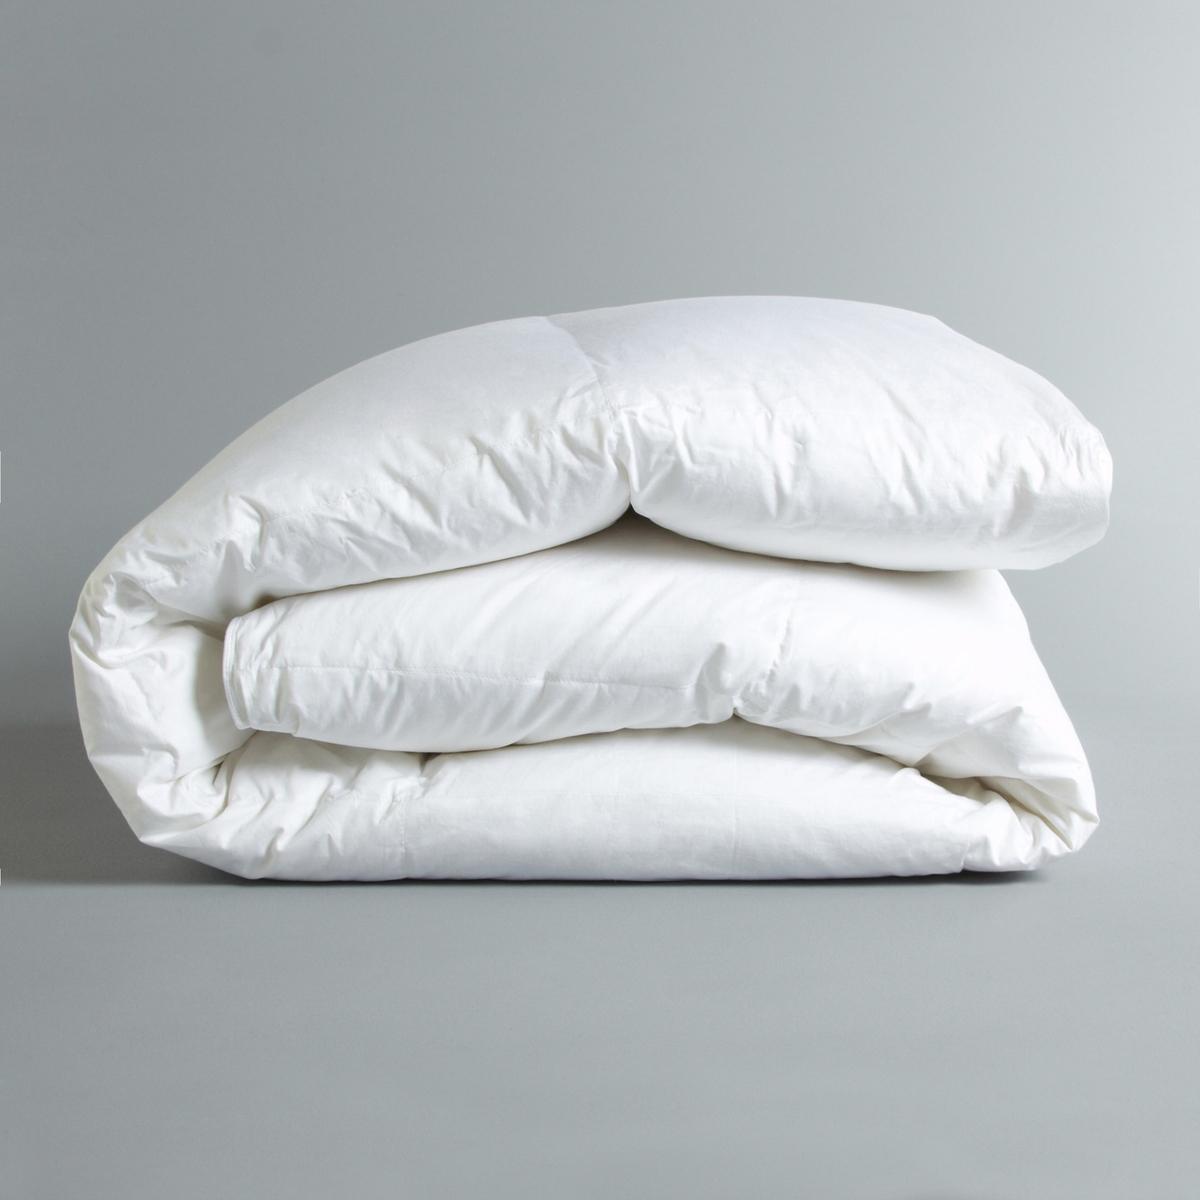 Синтетическое одеяло Banket